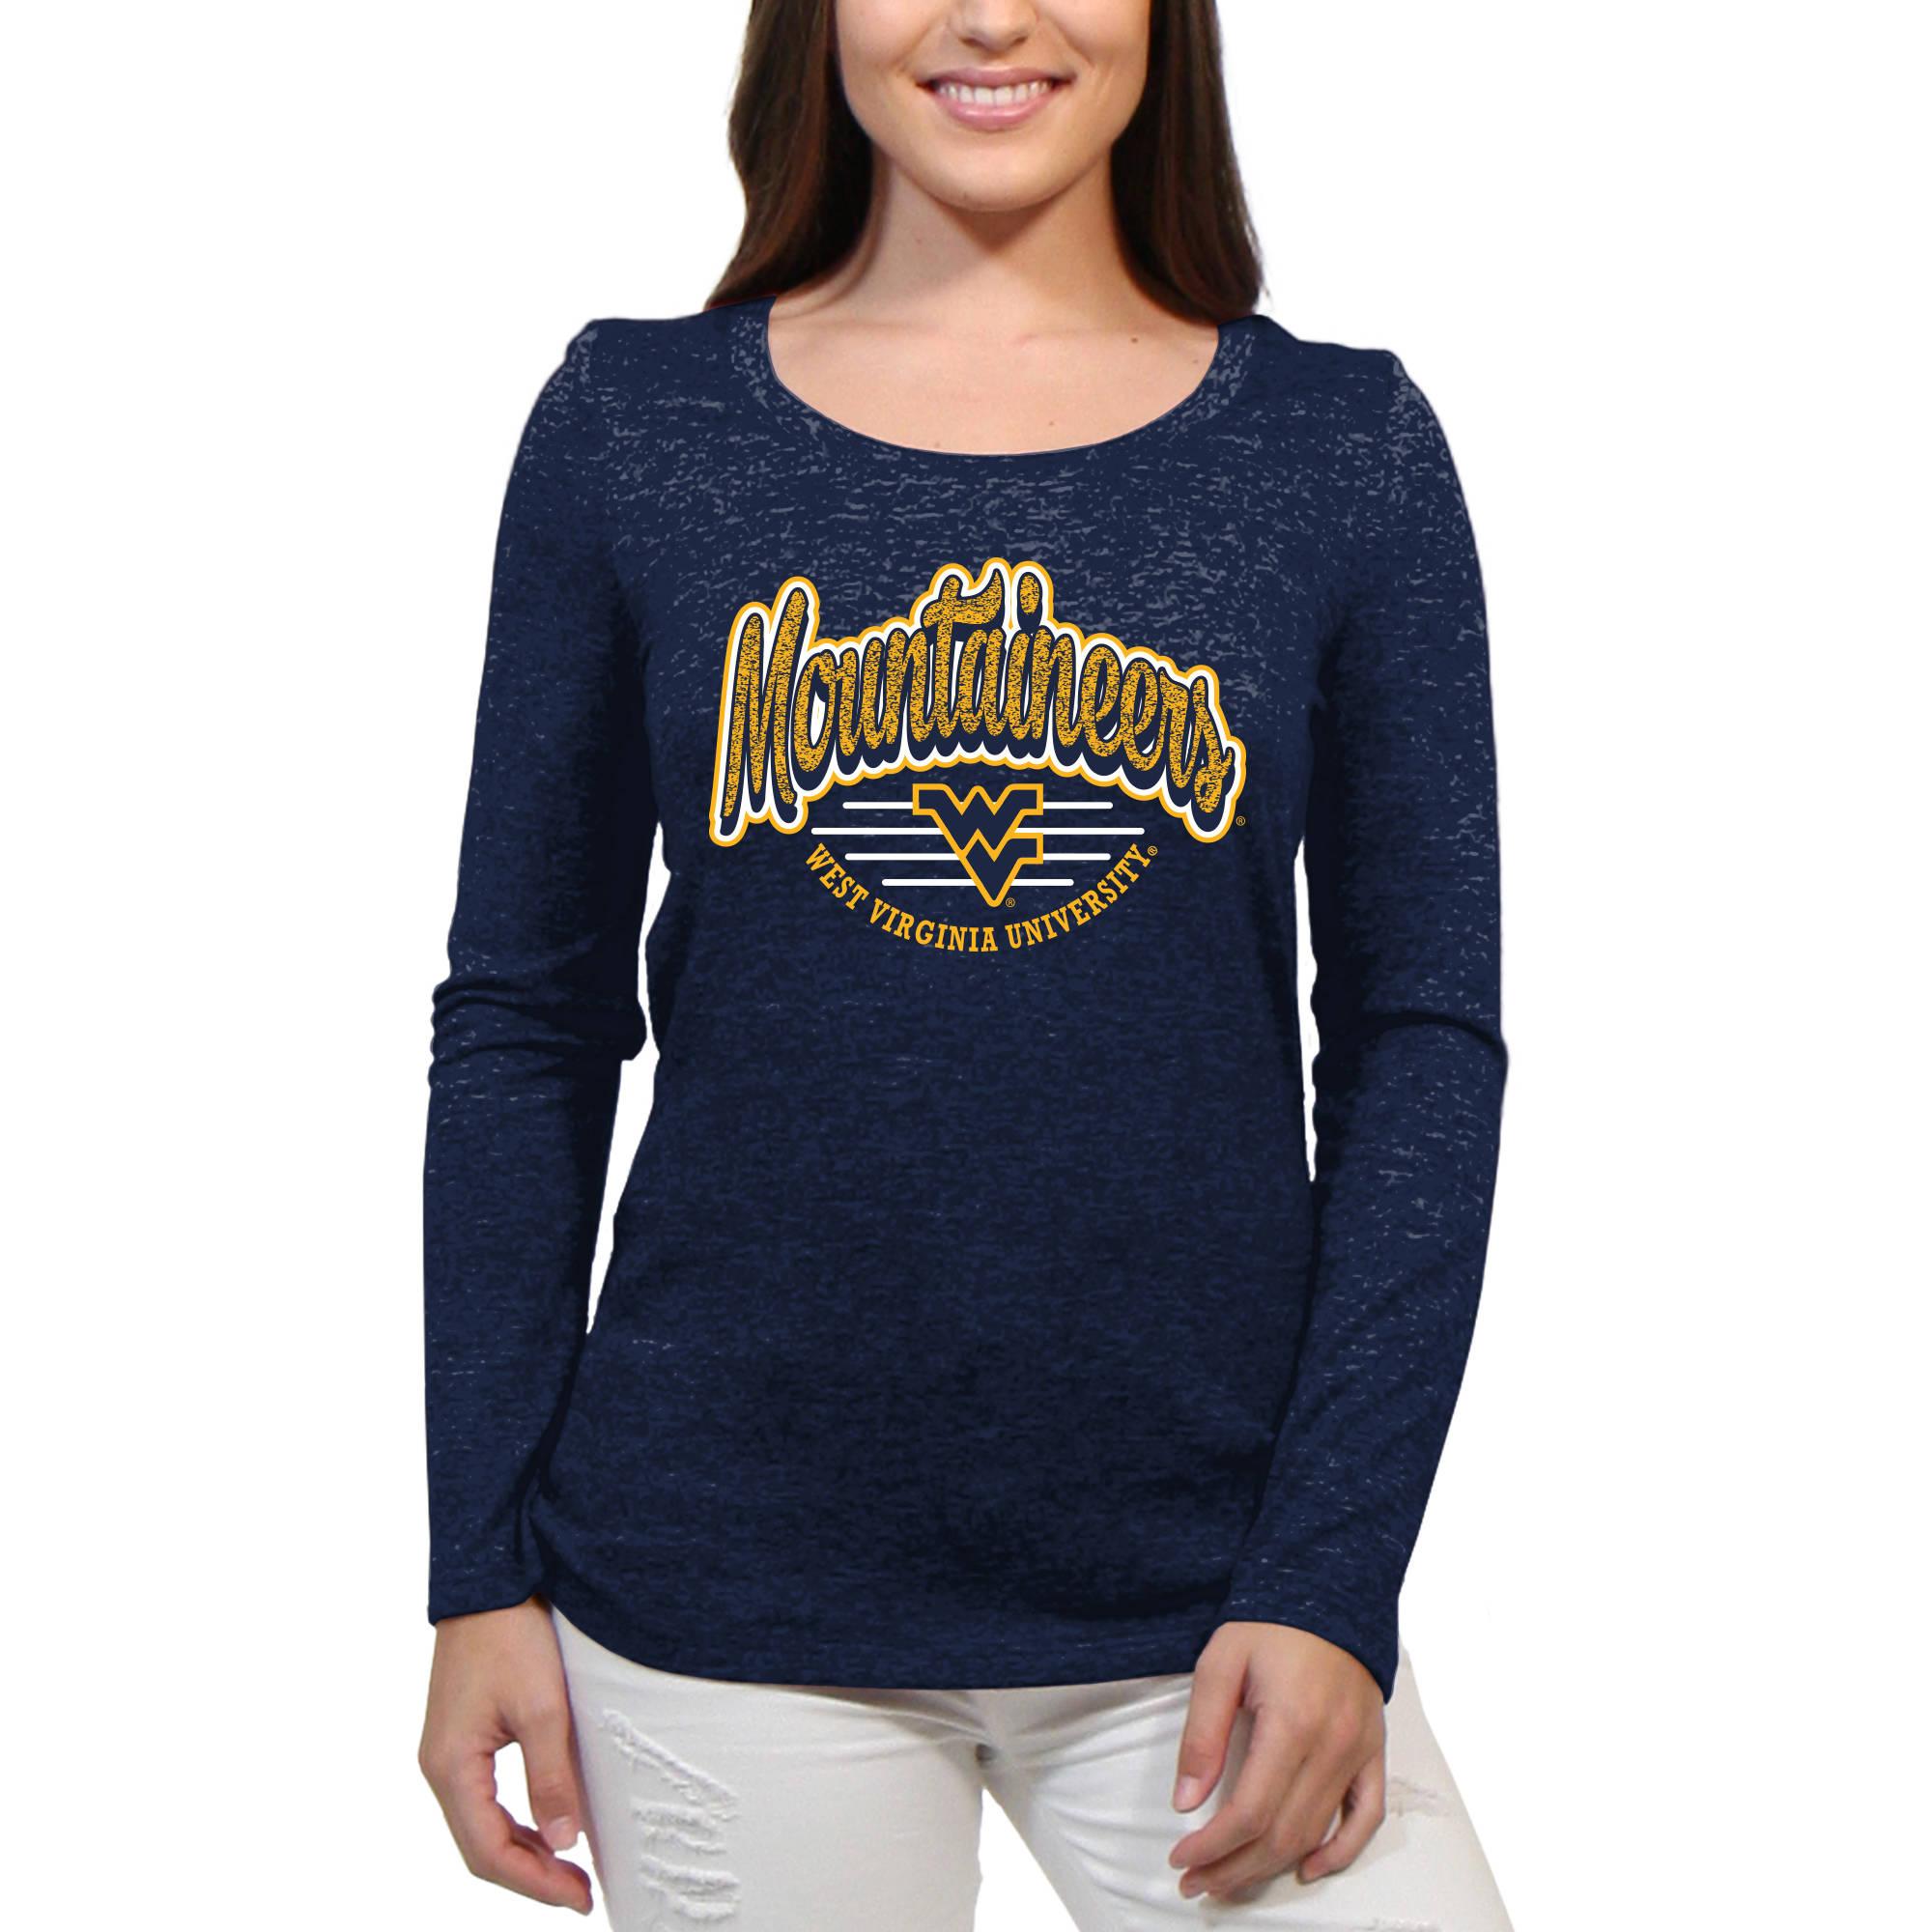 West Virginia Mountaineers Funky Script Women'S/Juniors Team Long Sleeve Scoop Neck Shirt